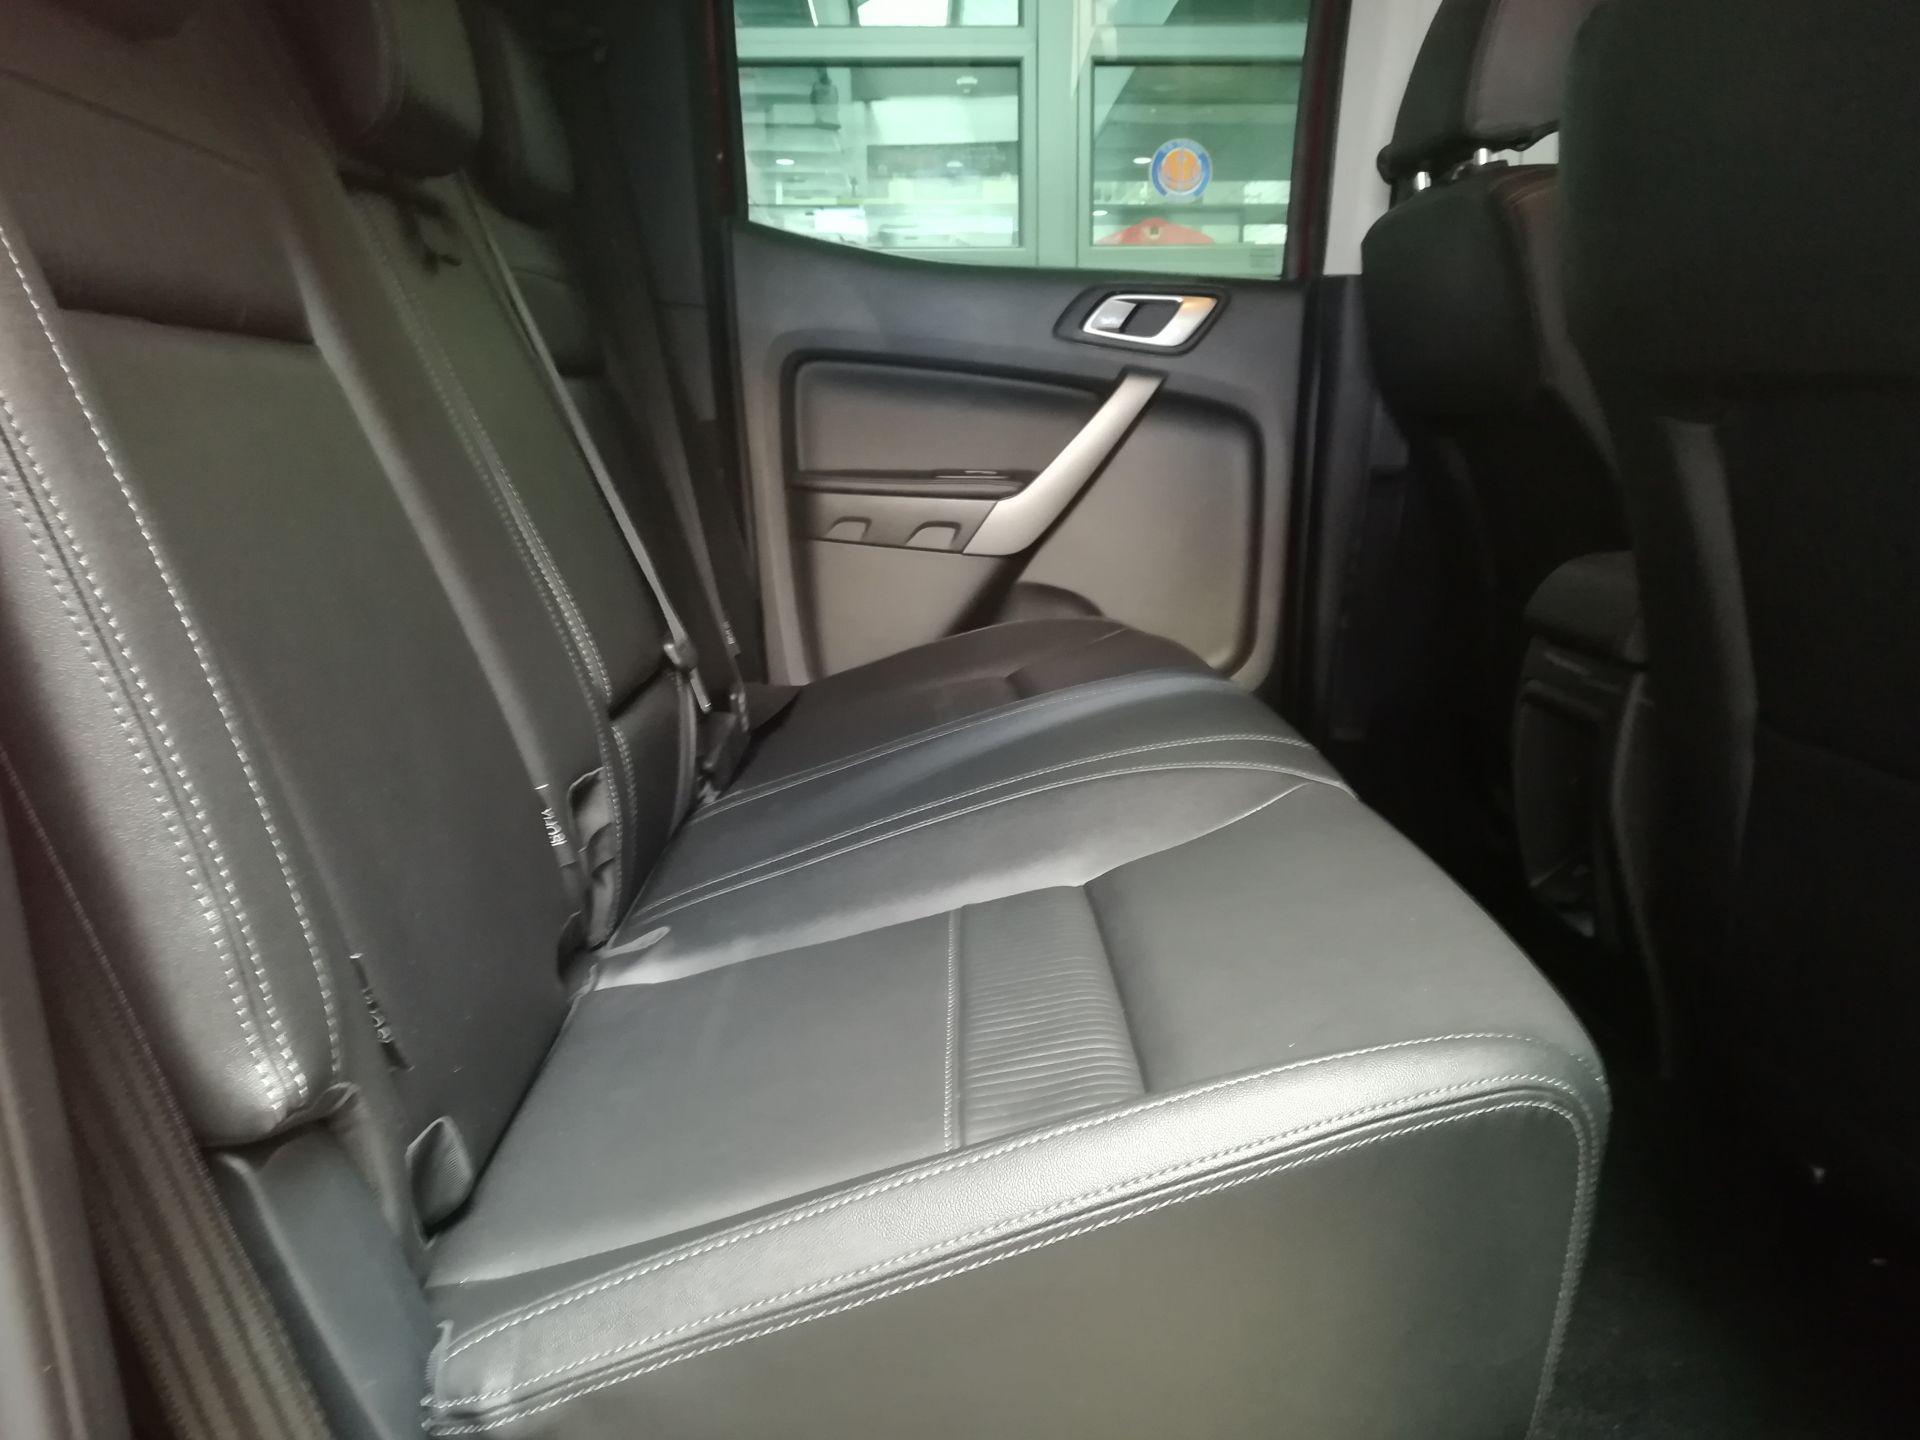 Ford Ranger 2.0 TDCi 125kW 4x4 Dob Cab. XLT Ltd S/S